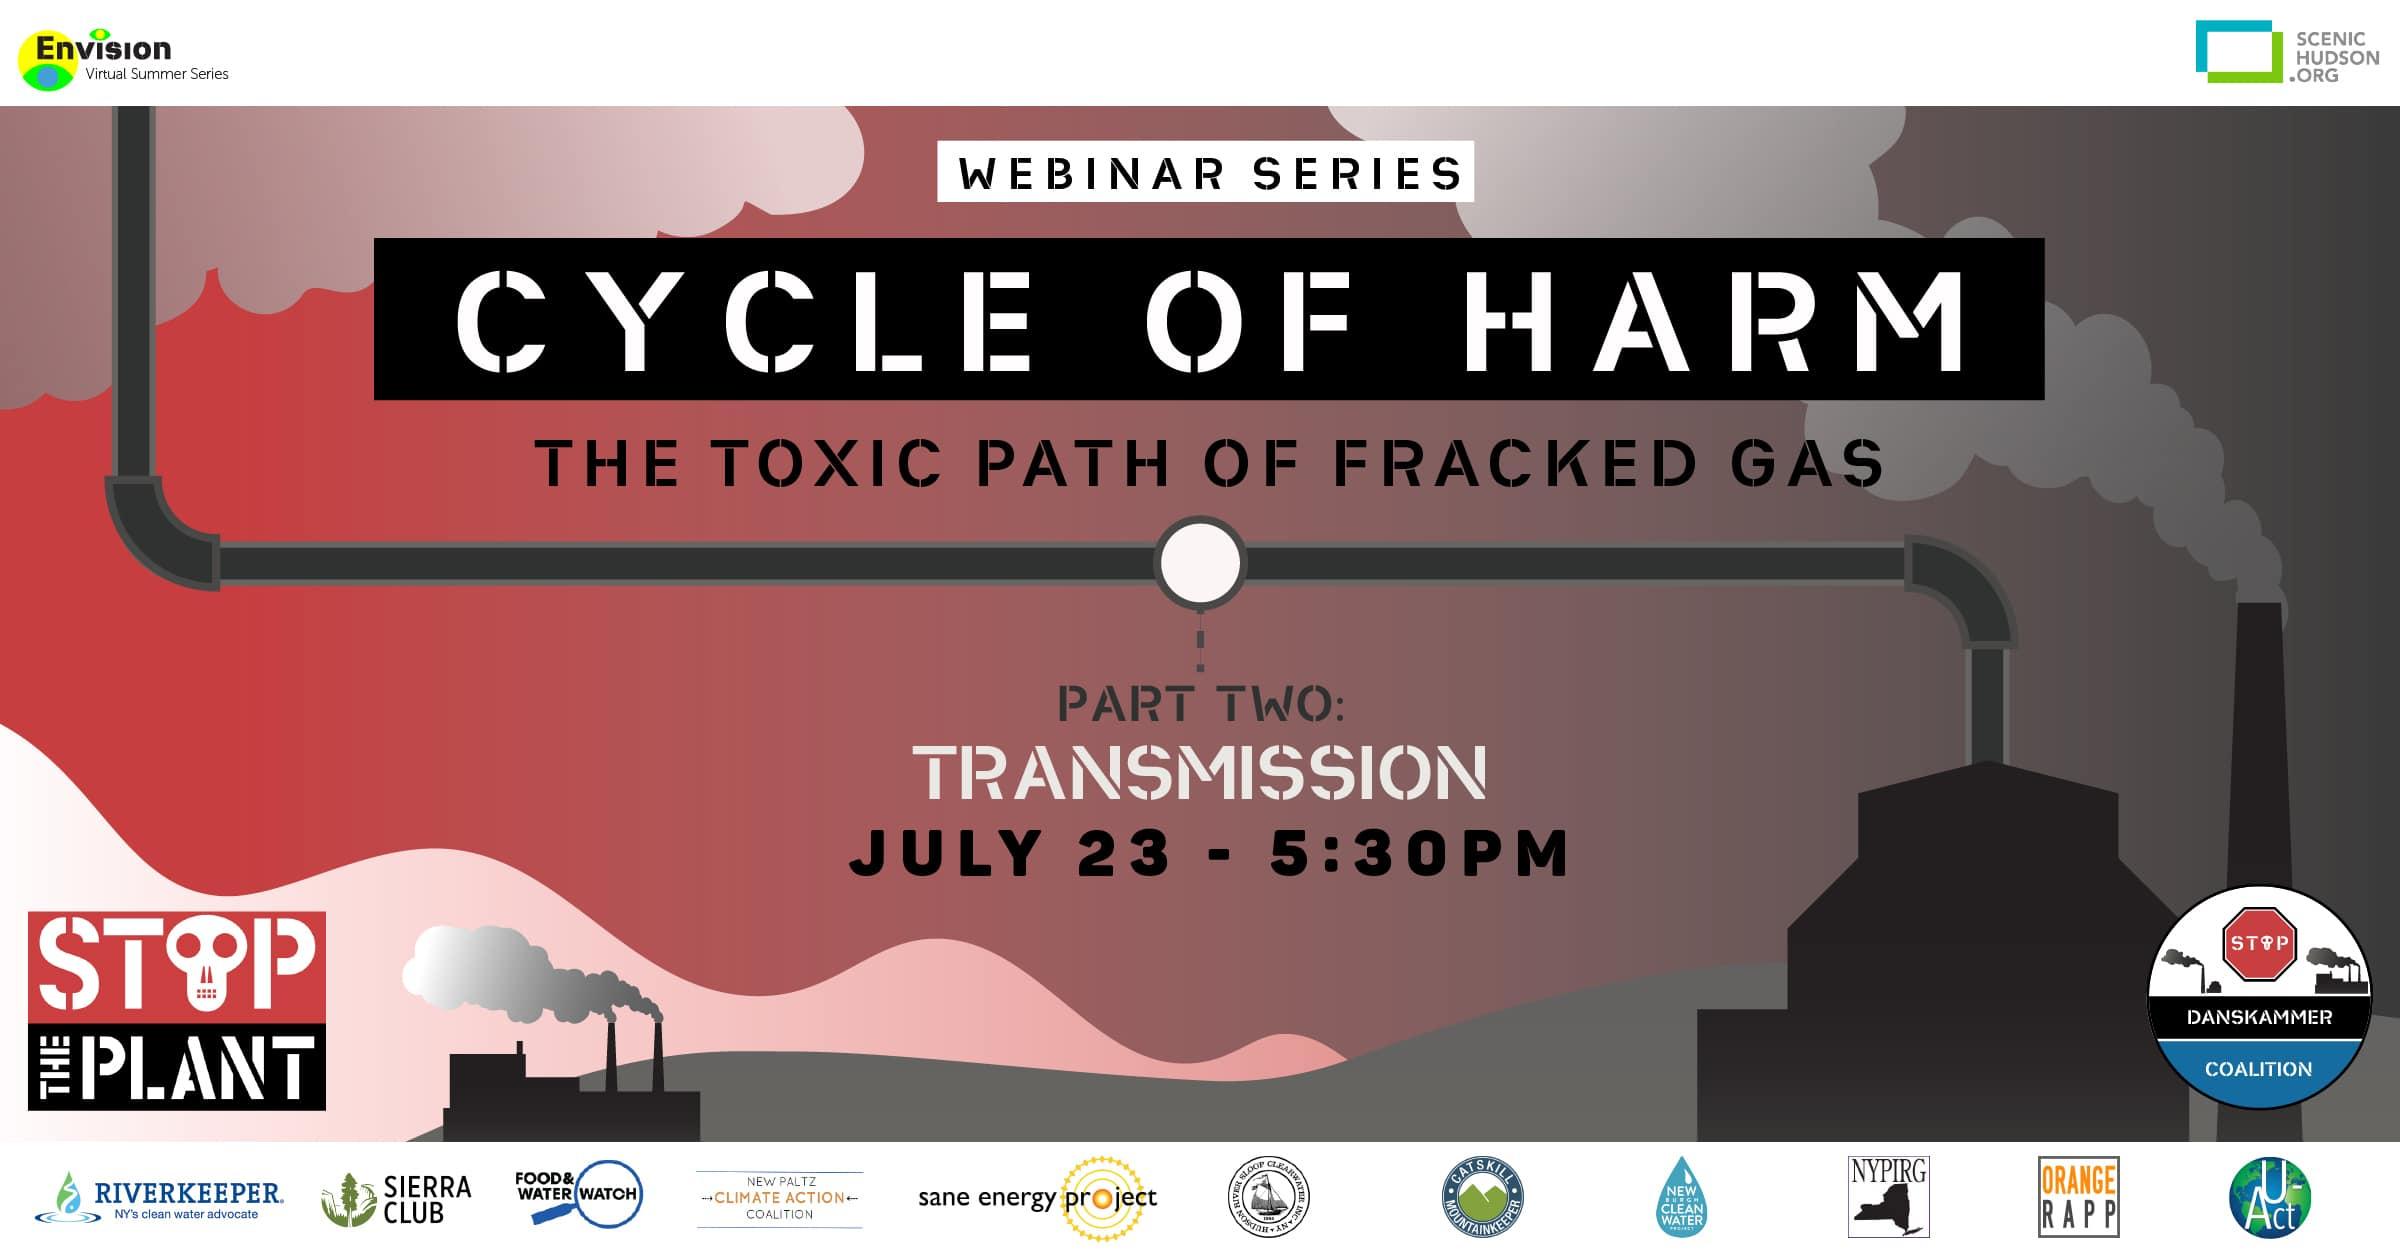 Cycle of Harm Webinar